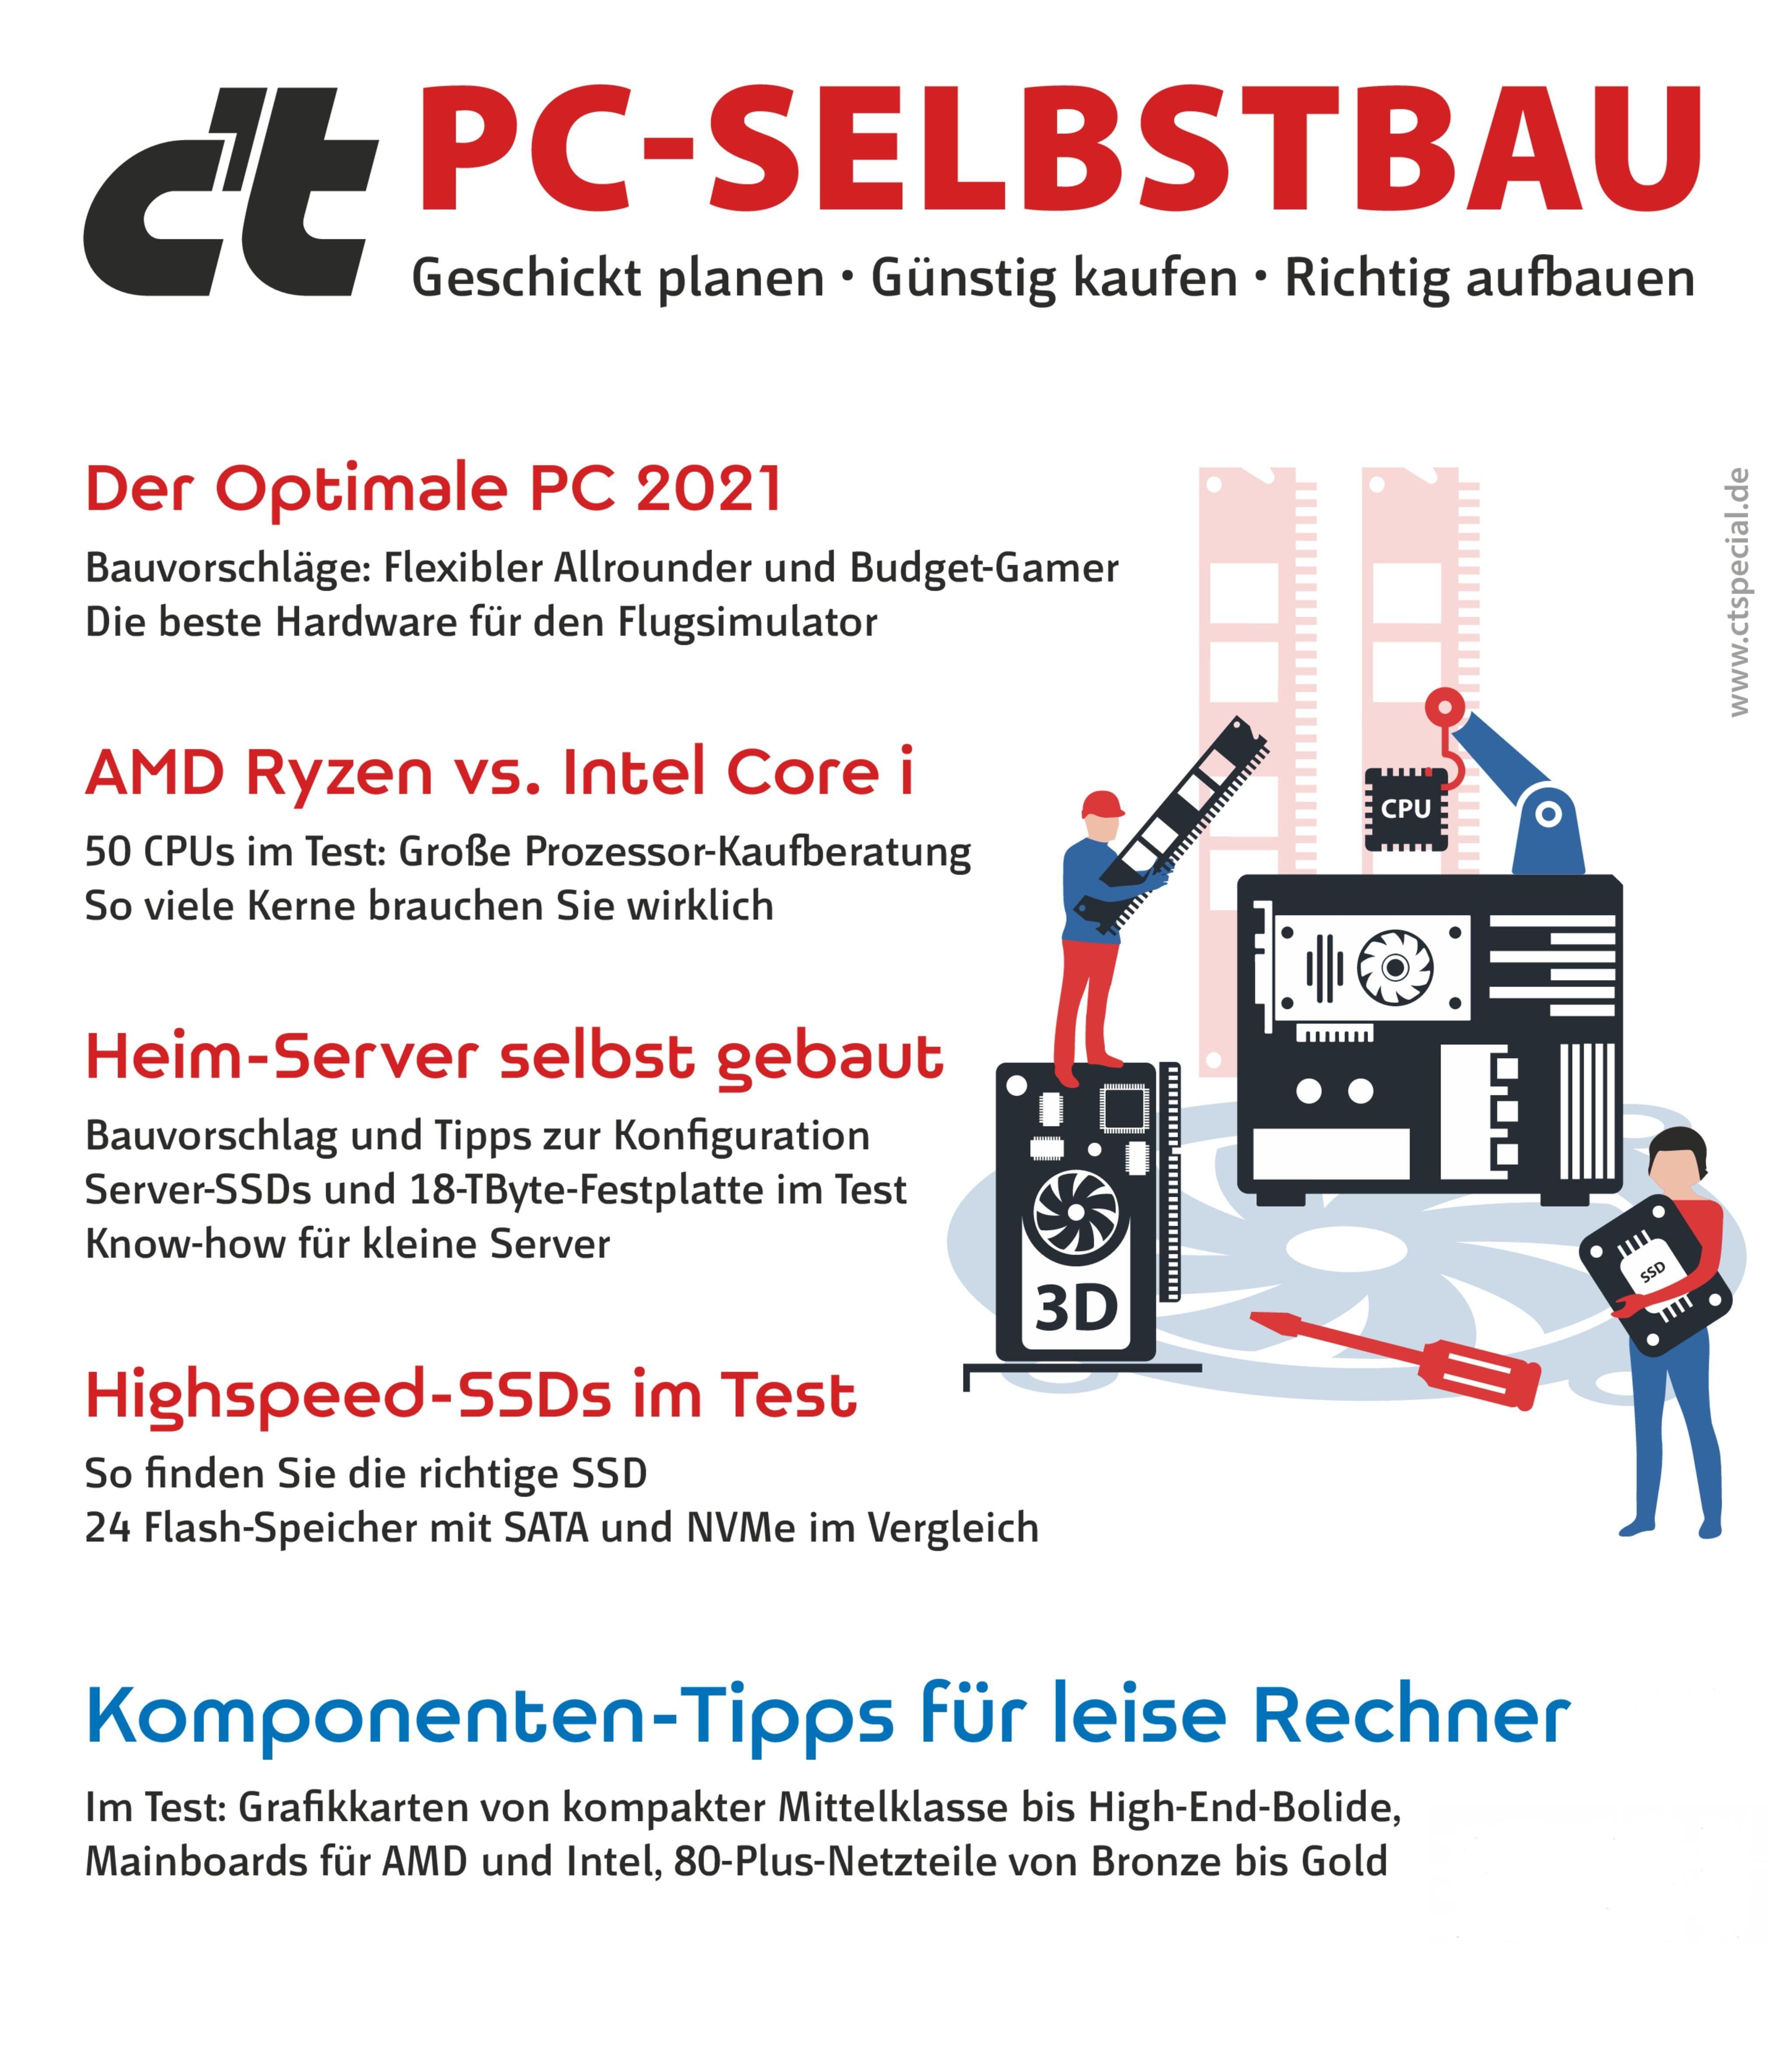 c't PC-Selbstbau 2020